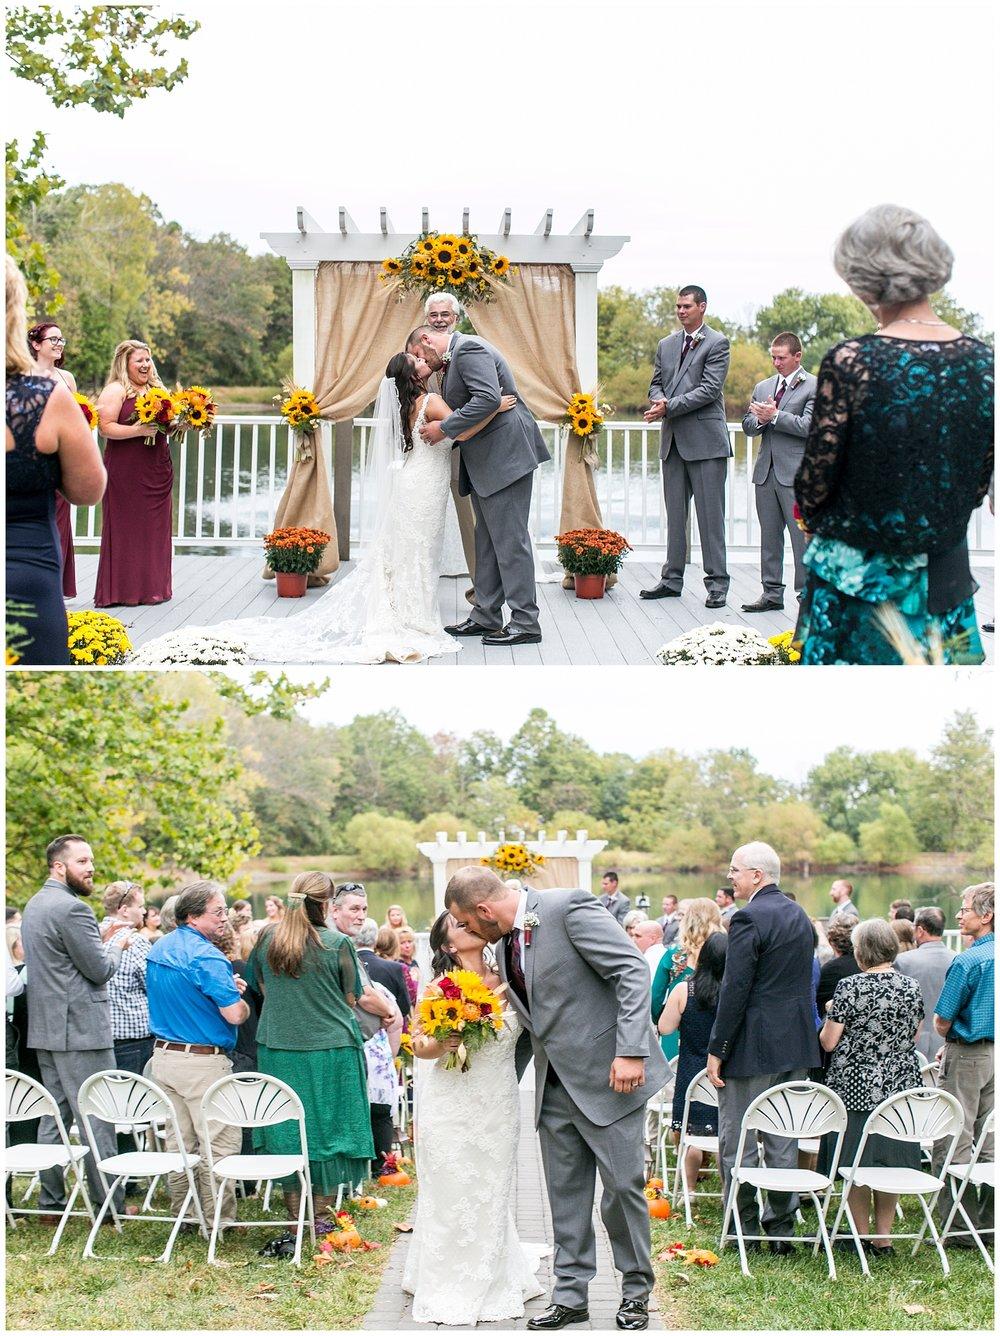 M+K Lodges at Gettysburg Wedding LivingRadiantPhotographyphotos_0036.jpg